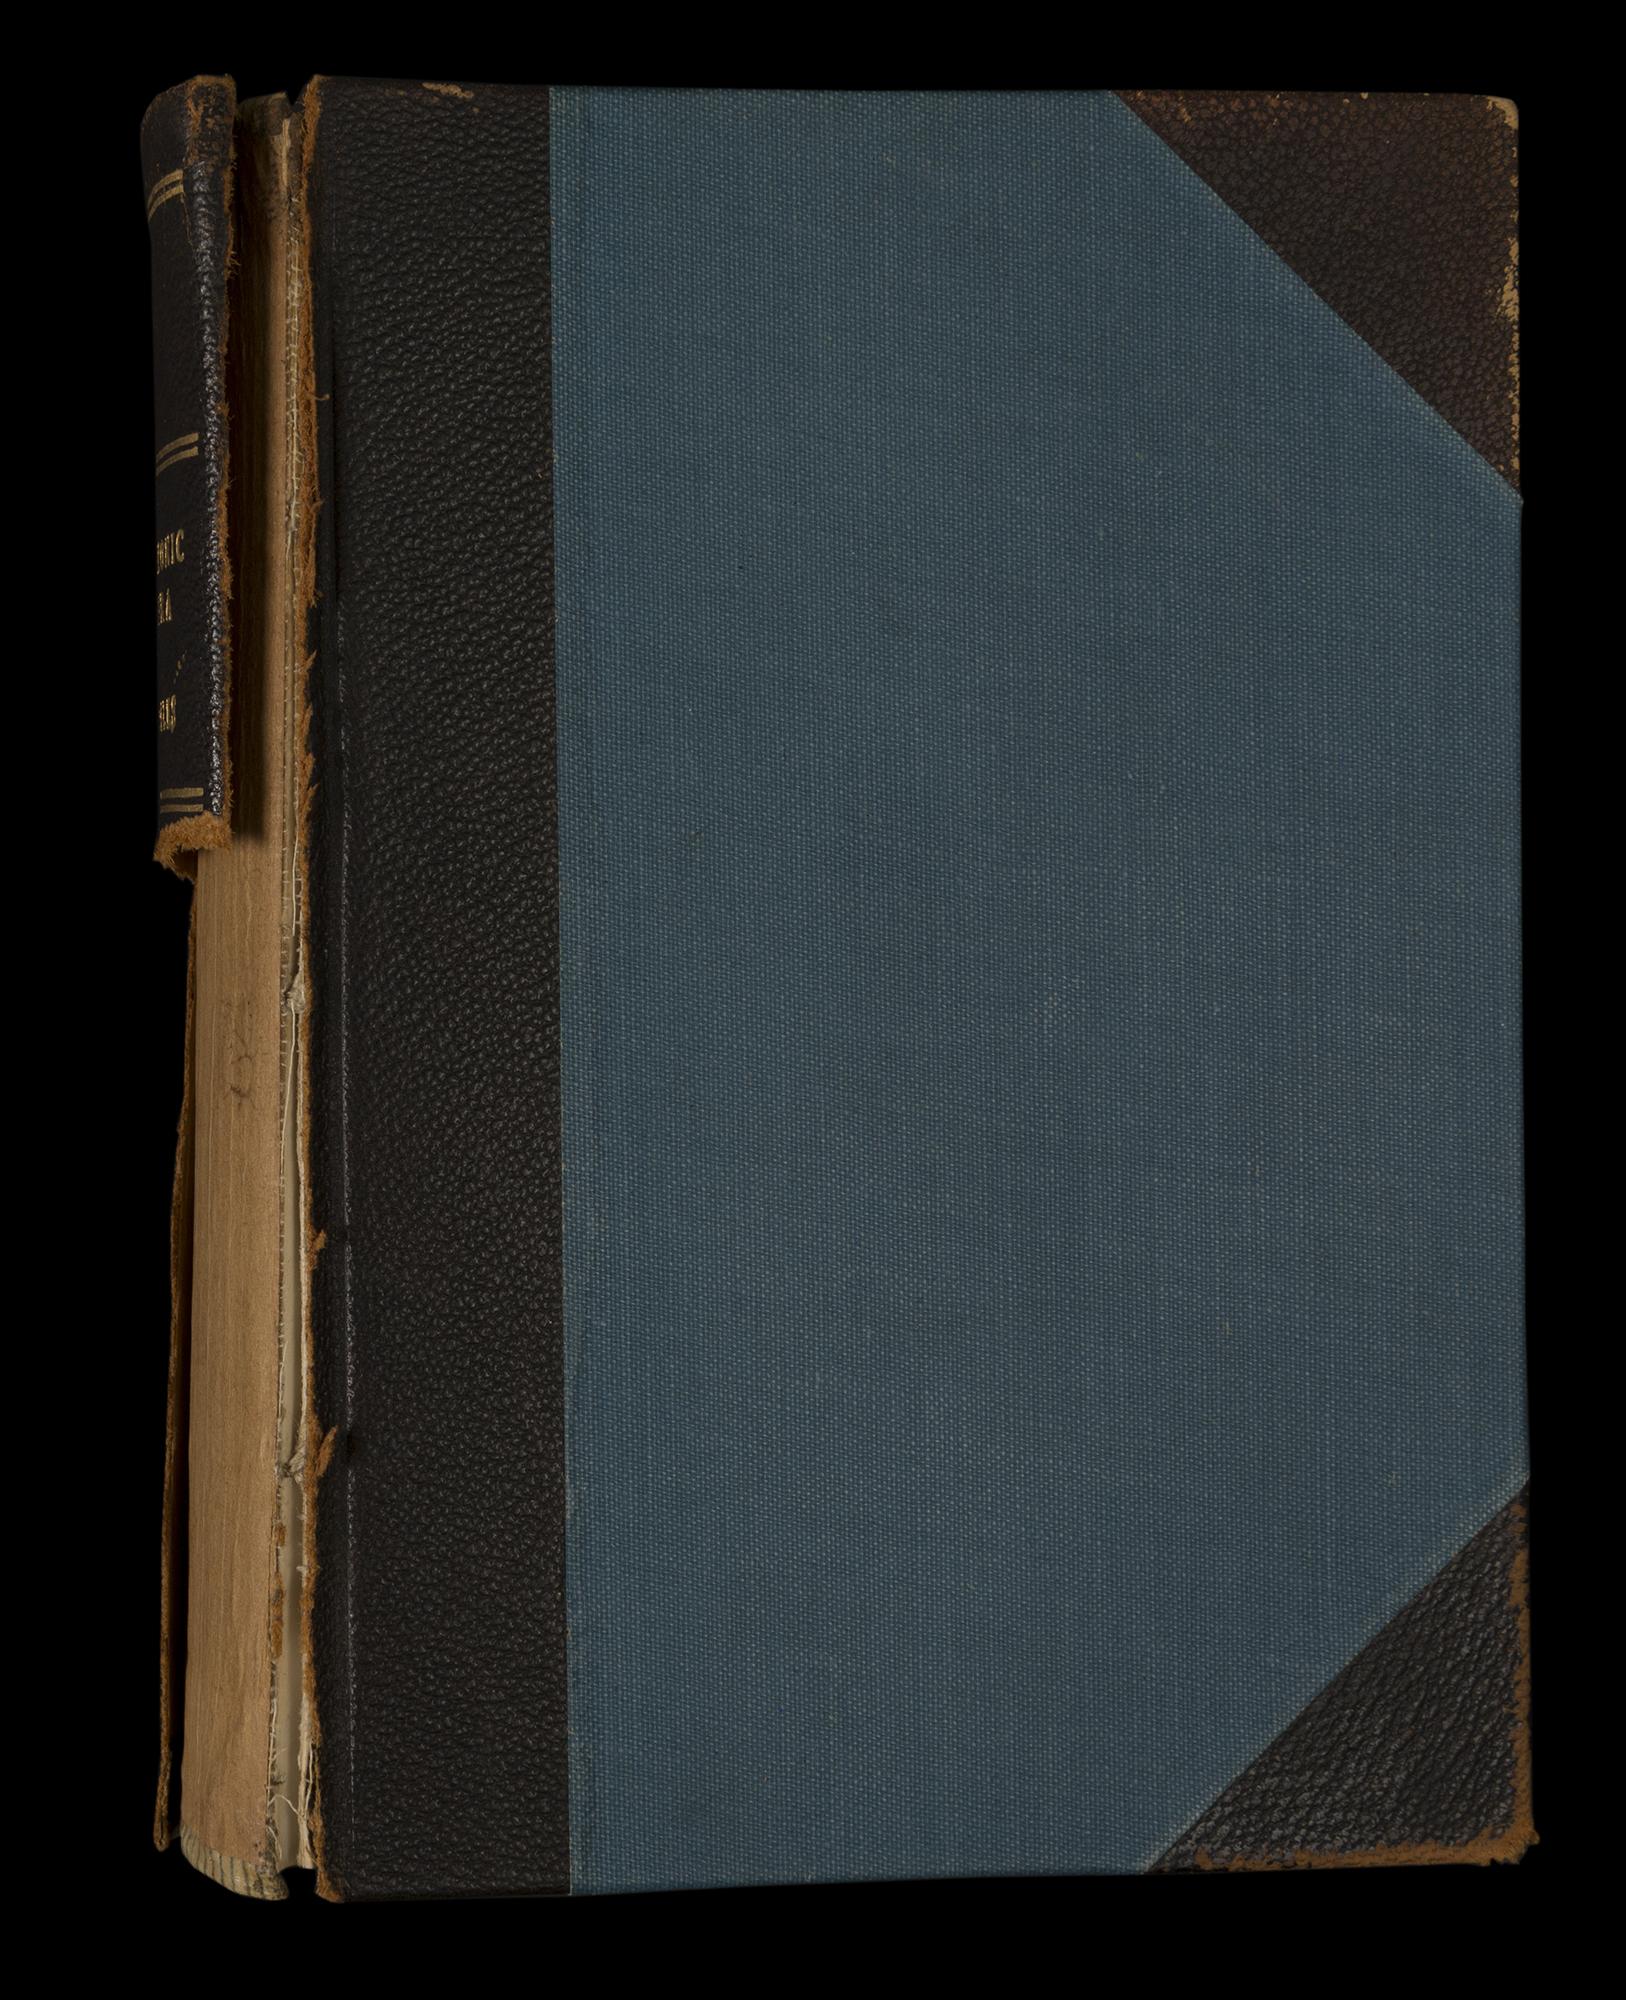 LAPO_ProgramBook_Cover_1928-1929.jpg